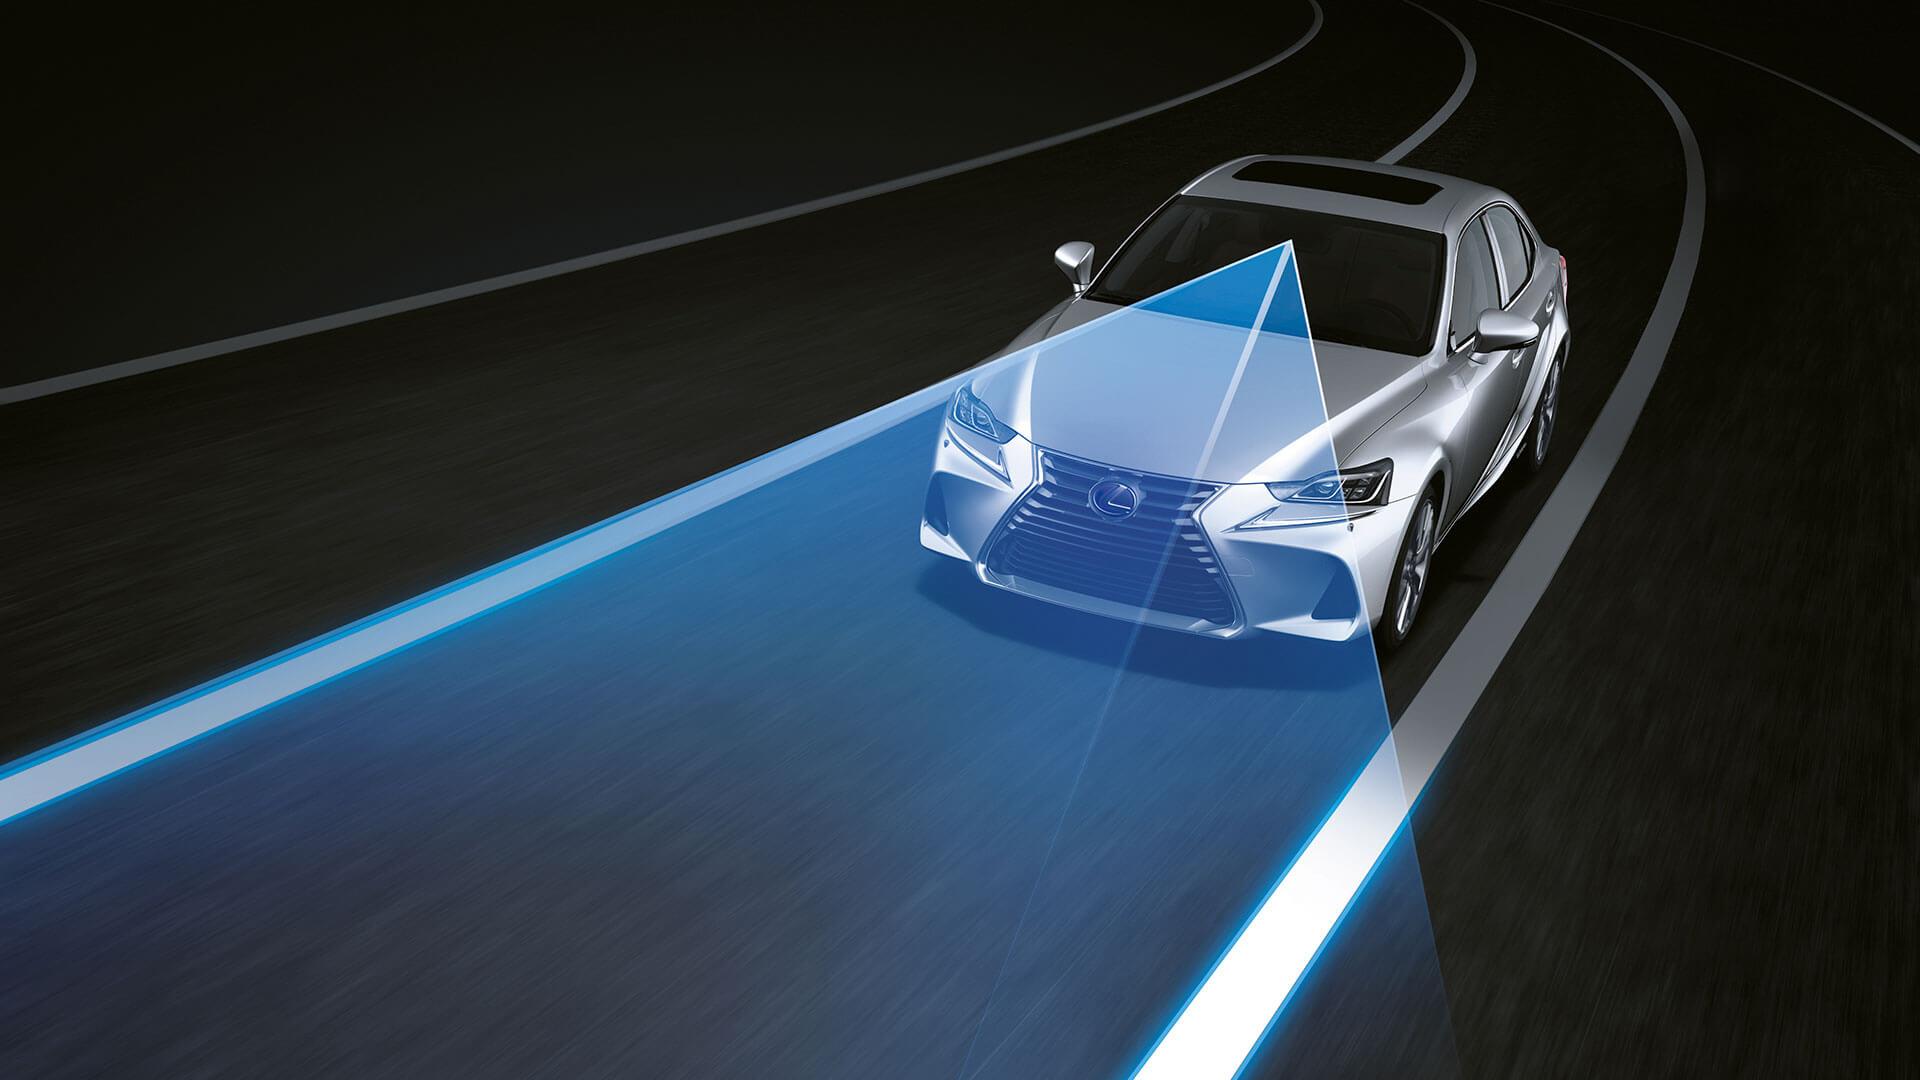 2017 lexus is 300h features lane keeping assist